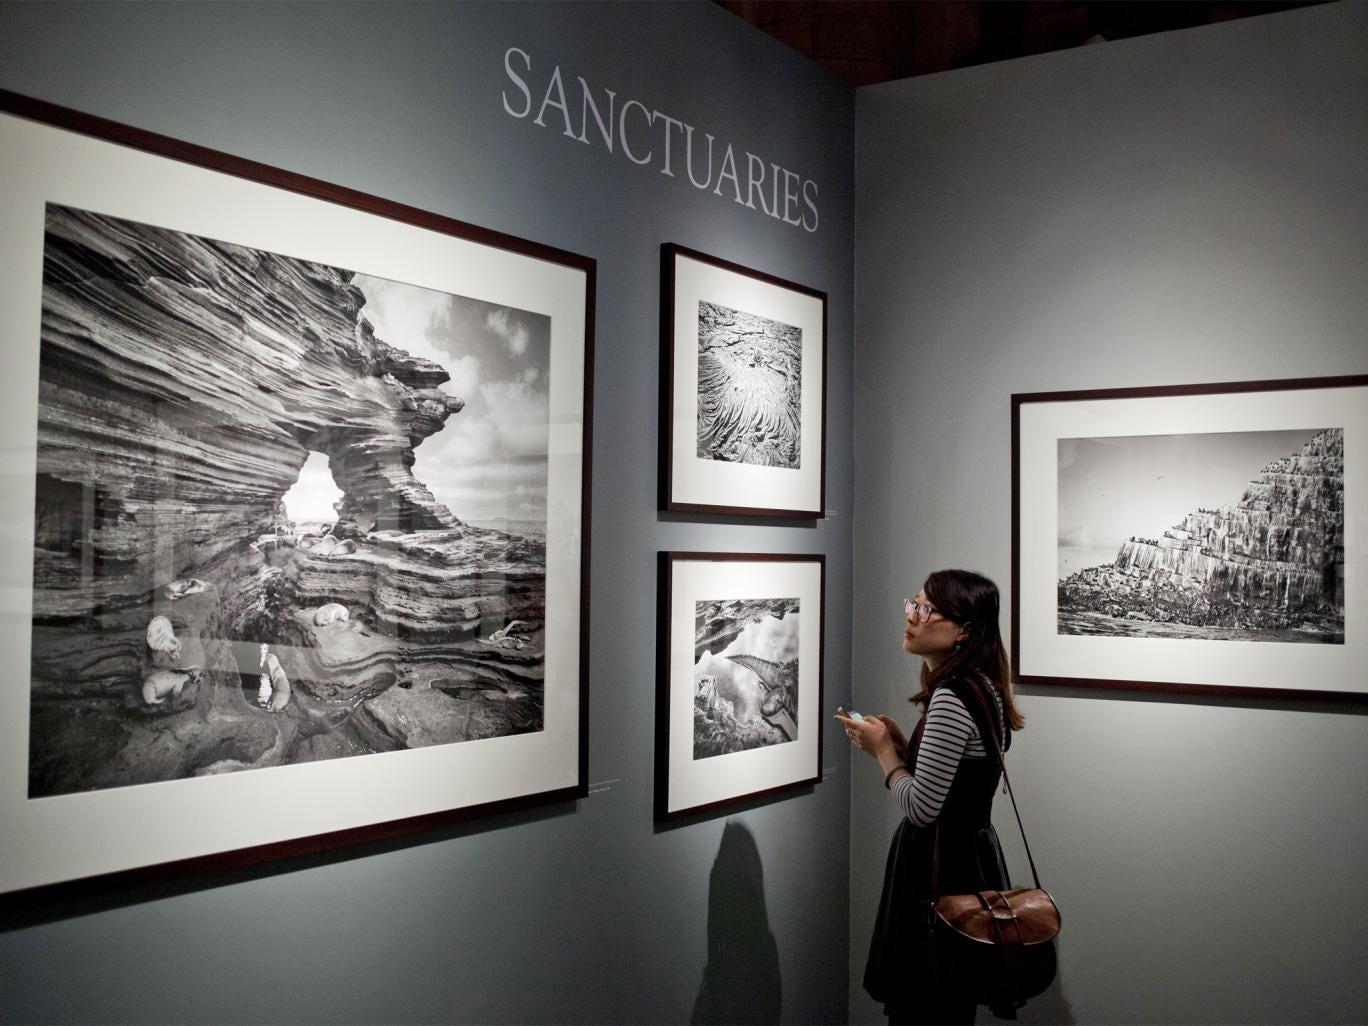 A woman looks at work by Sebastião Salgado at the Natural History Museum